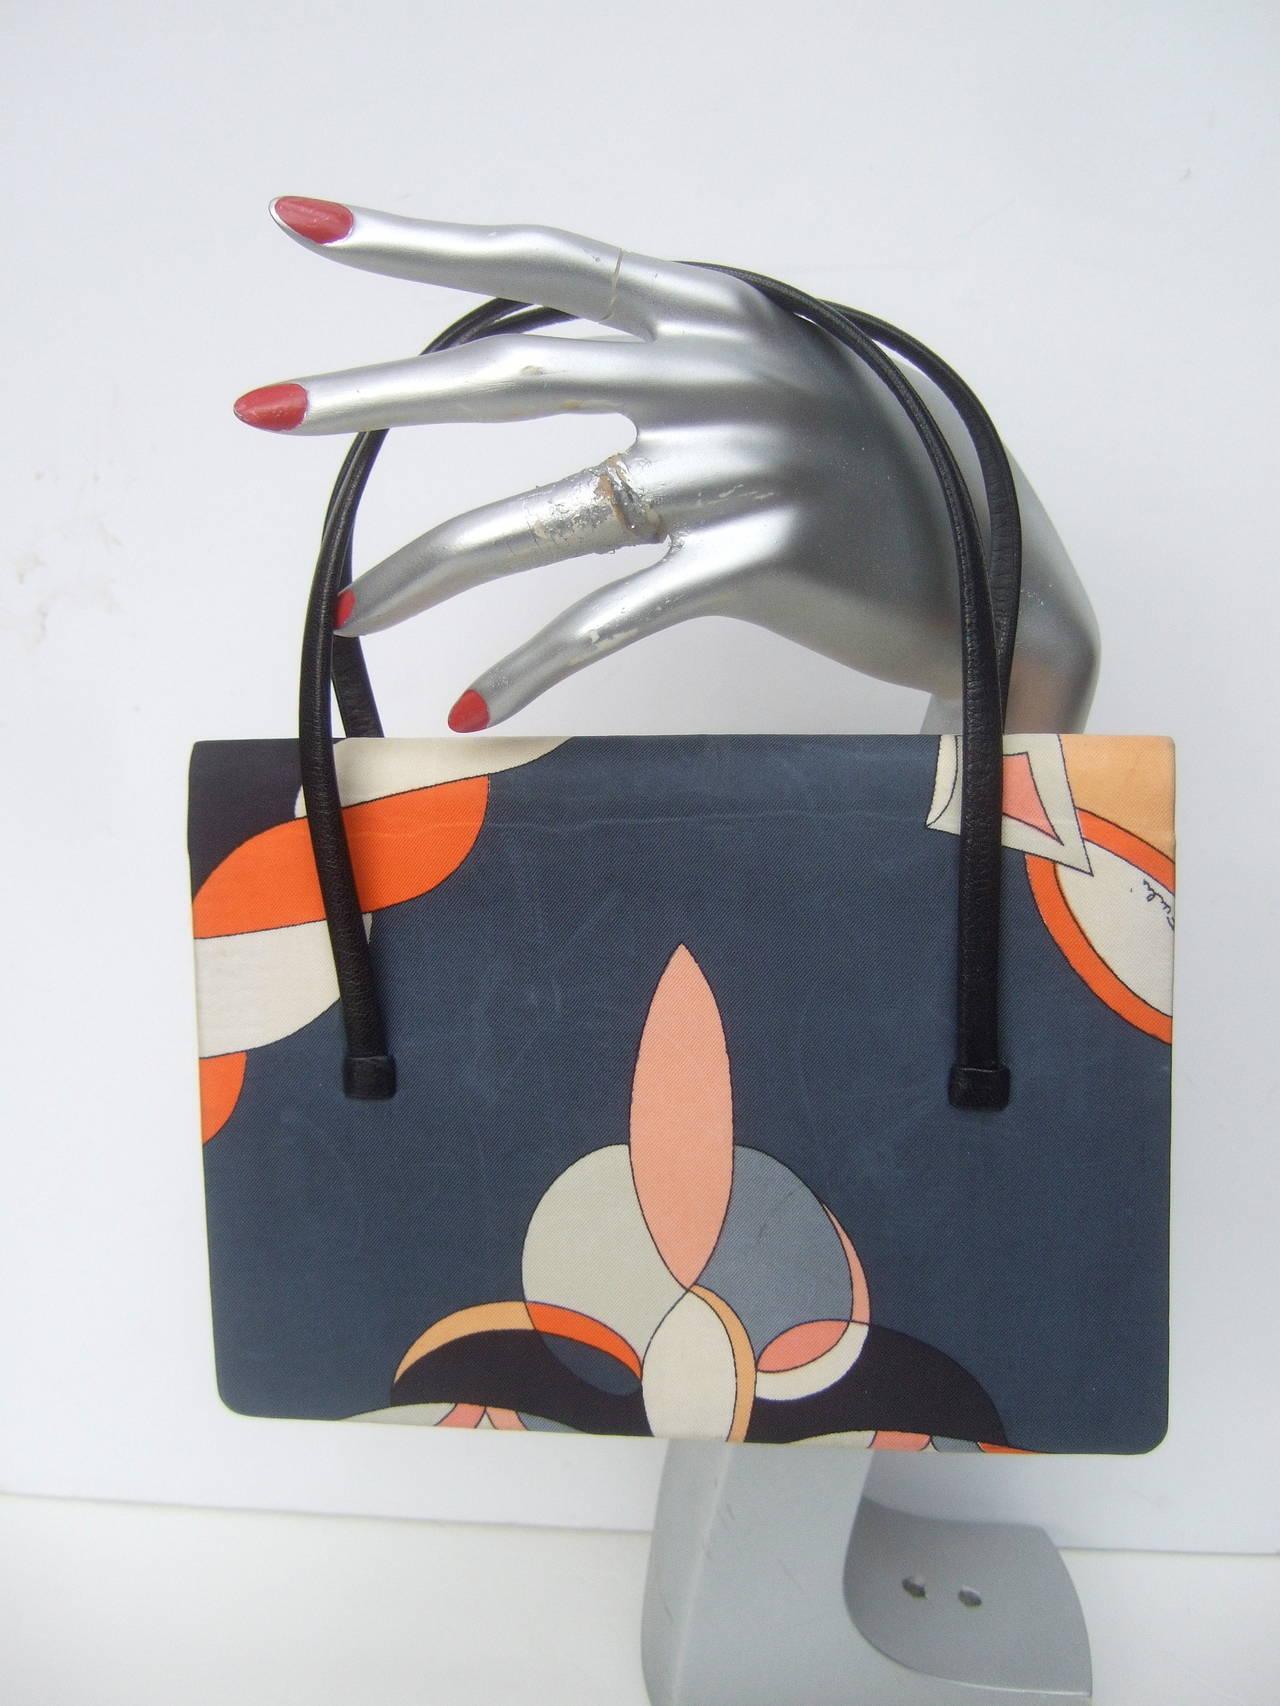 Emilio Pucci Italy Silk Diminutive Envelope Style Handbag c 1970 In Good Condition For Sale In Santa Barbara, CA